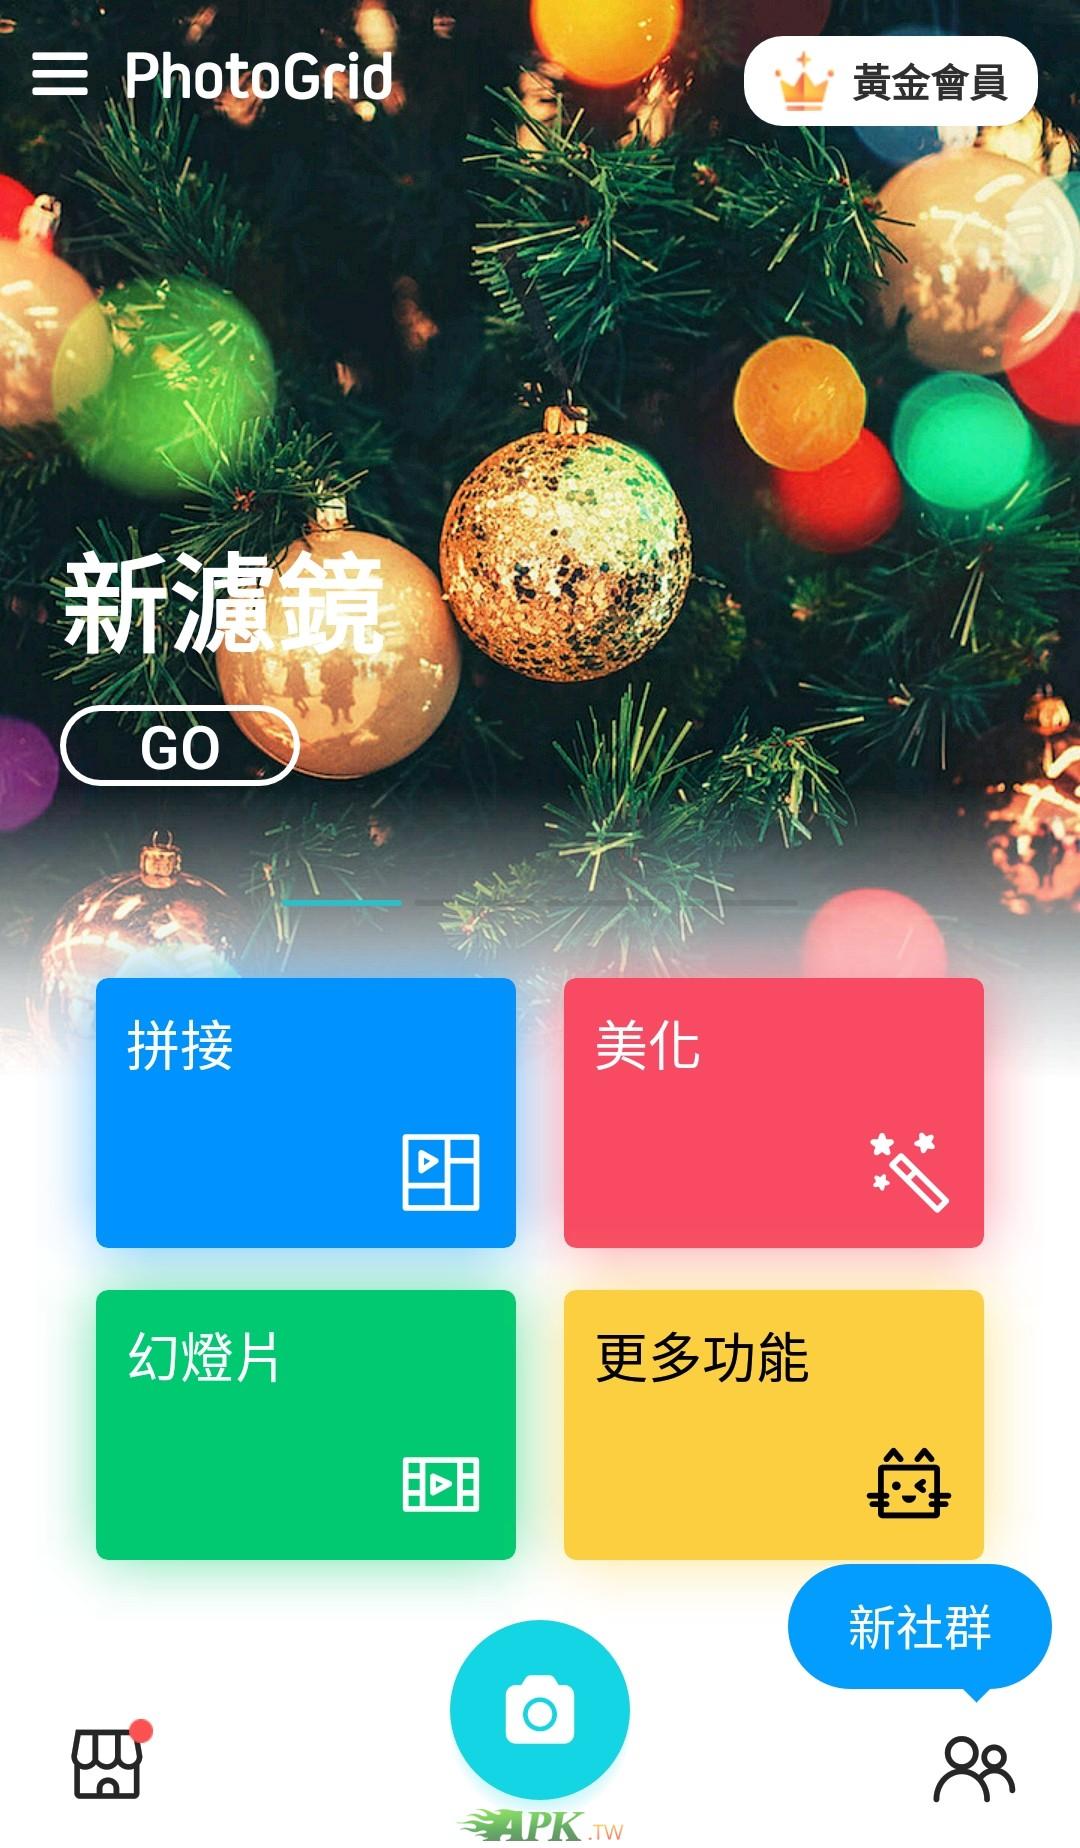 PhotoGrid_Pro_7.36_1.jpg